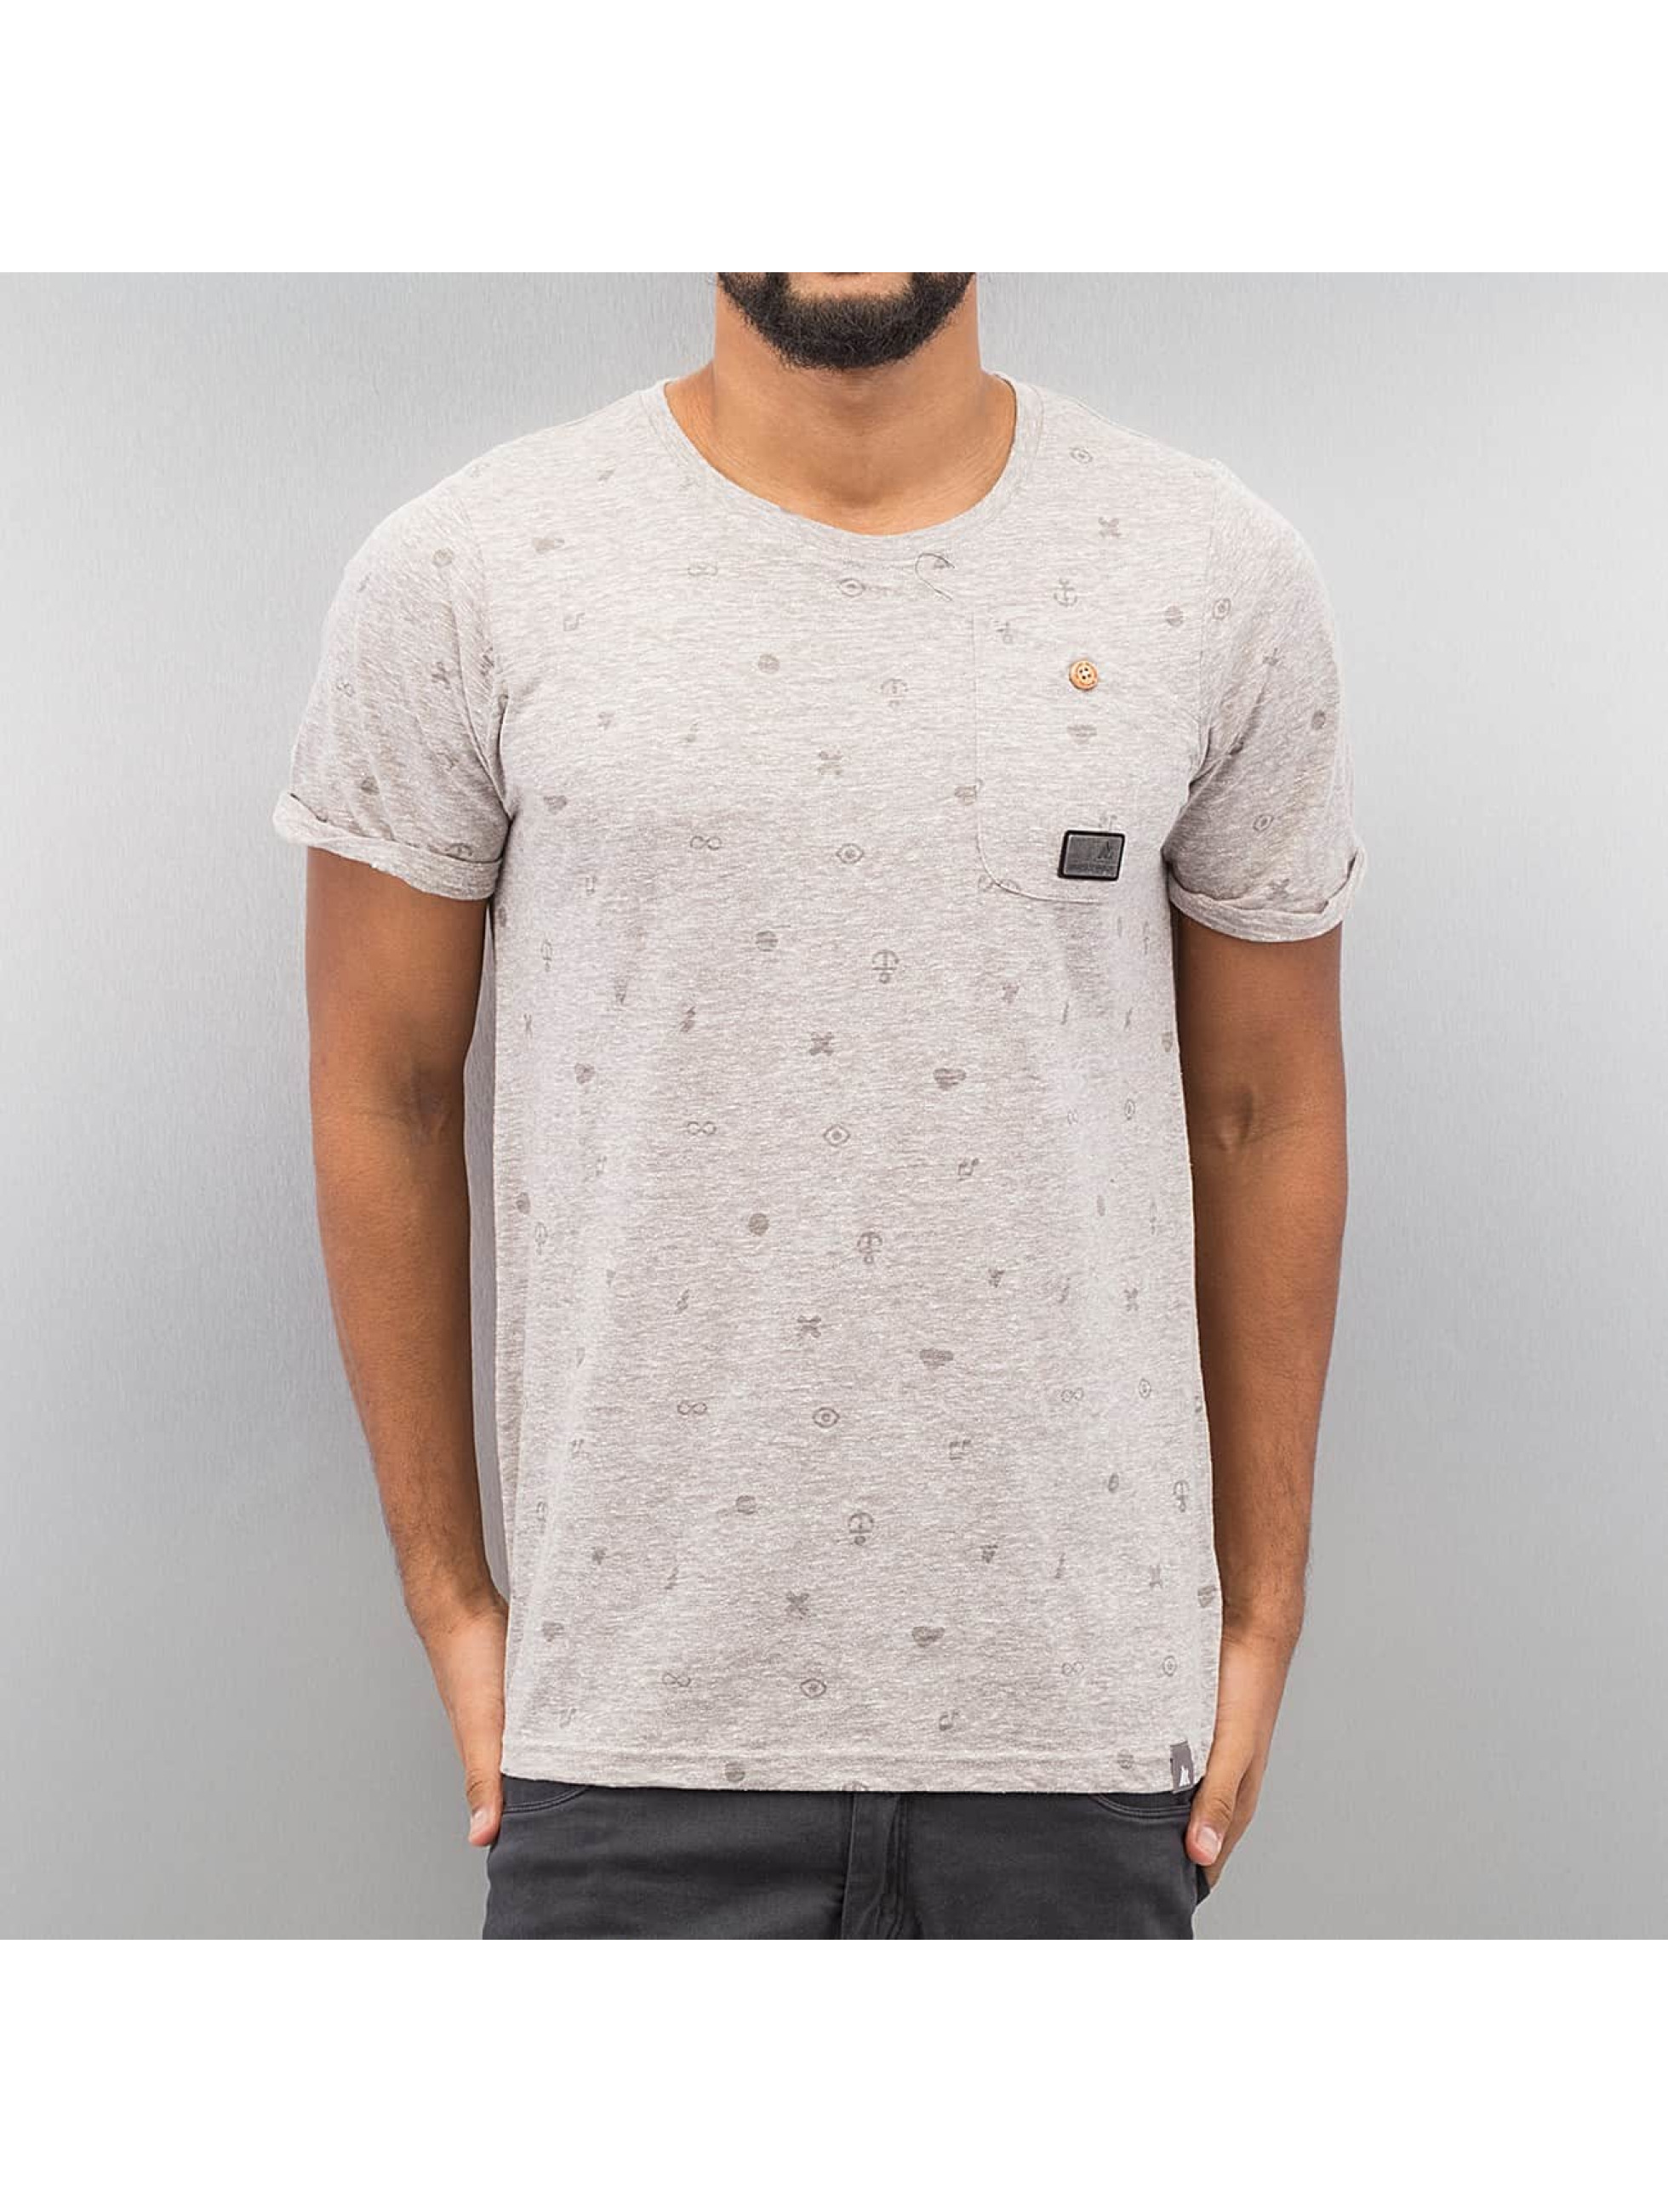 Alife & Kickin T-shirt Vin grigio